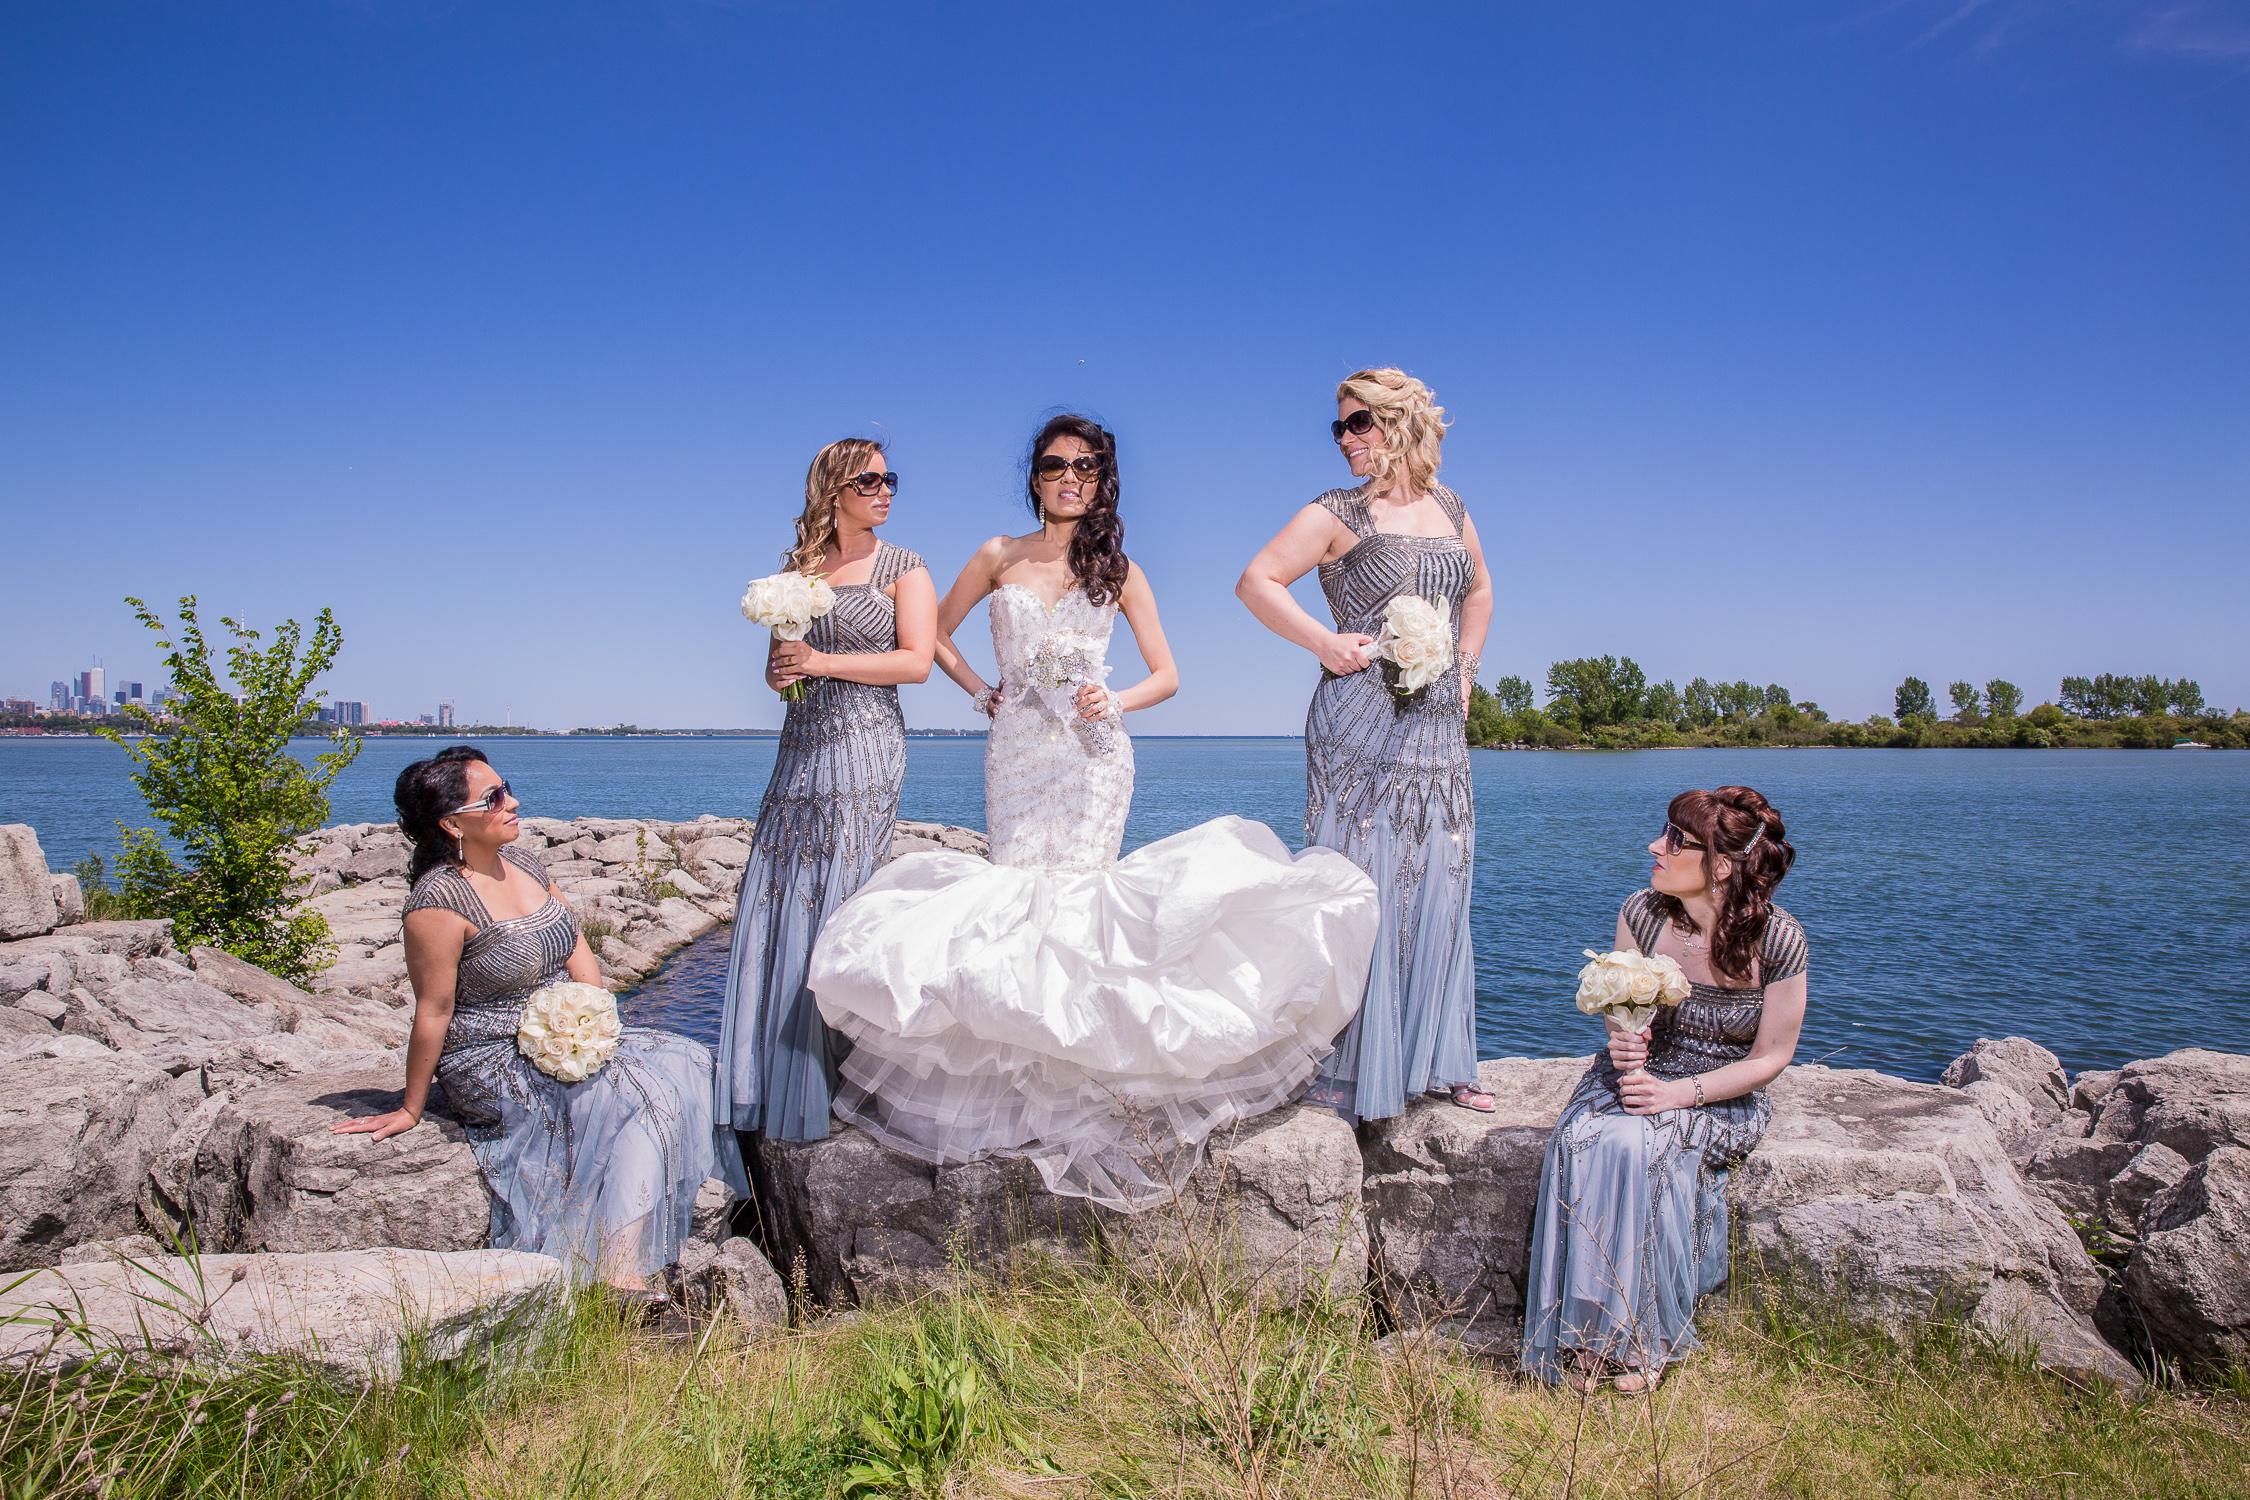 Paradise-Banquet-Hall-Wedding-Vaughan-Ontario-0059.jpg